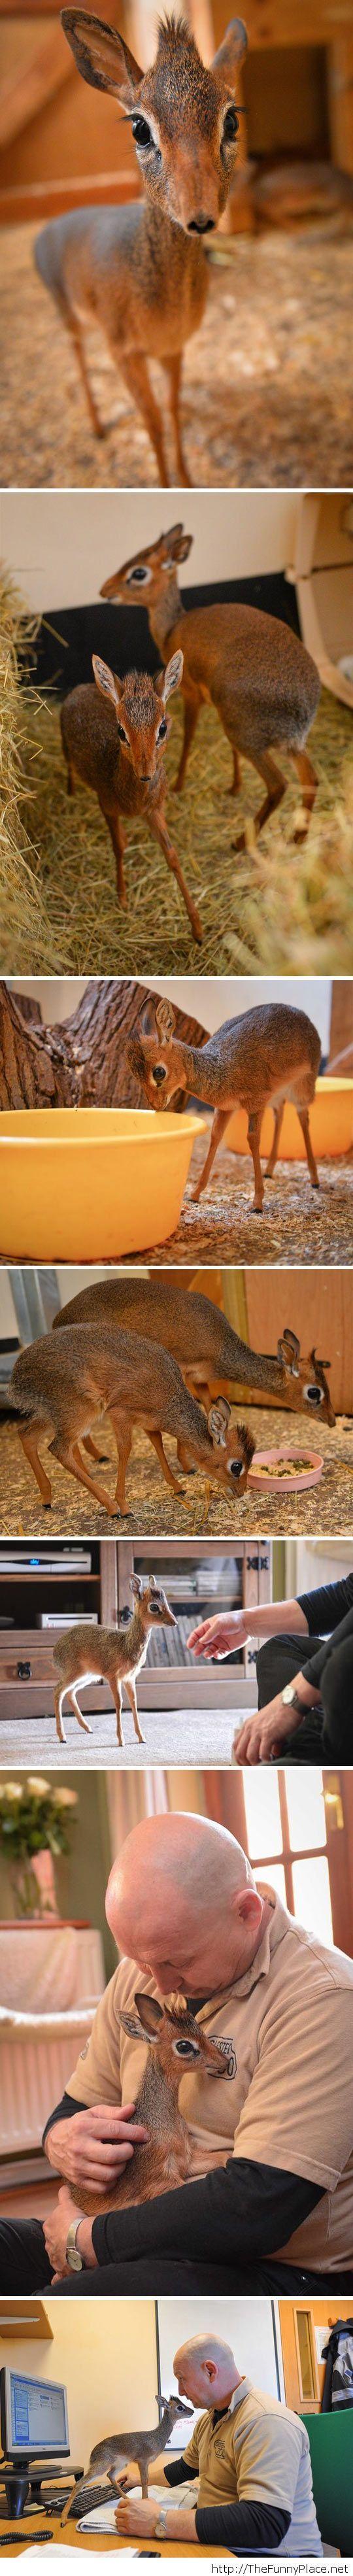 Dik-Dik, the smallest antelope…